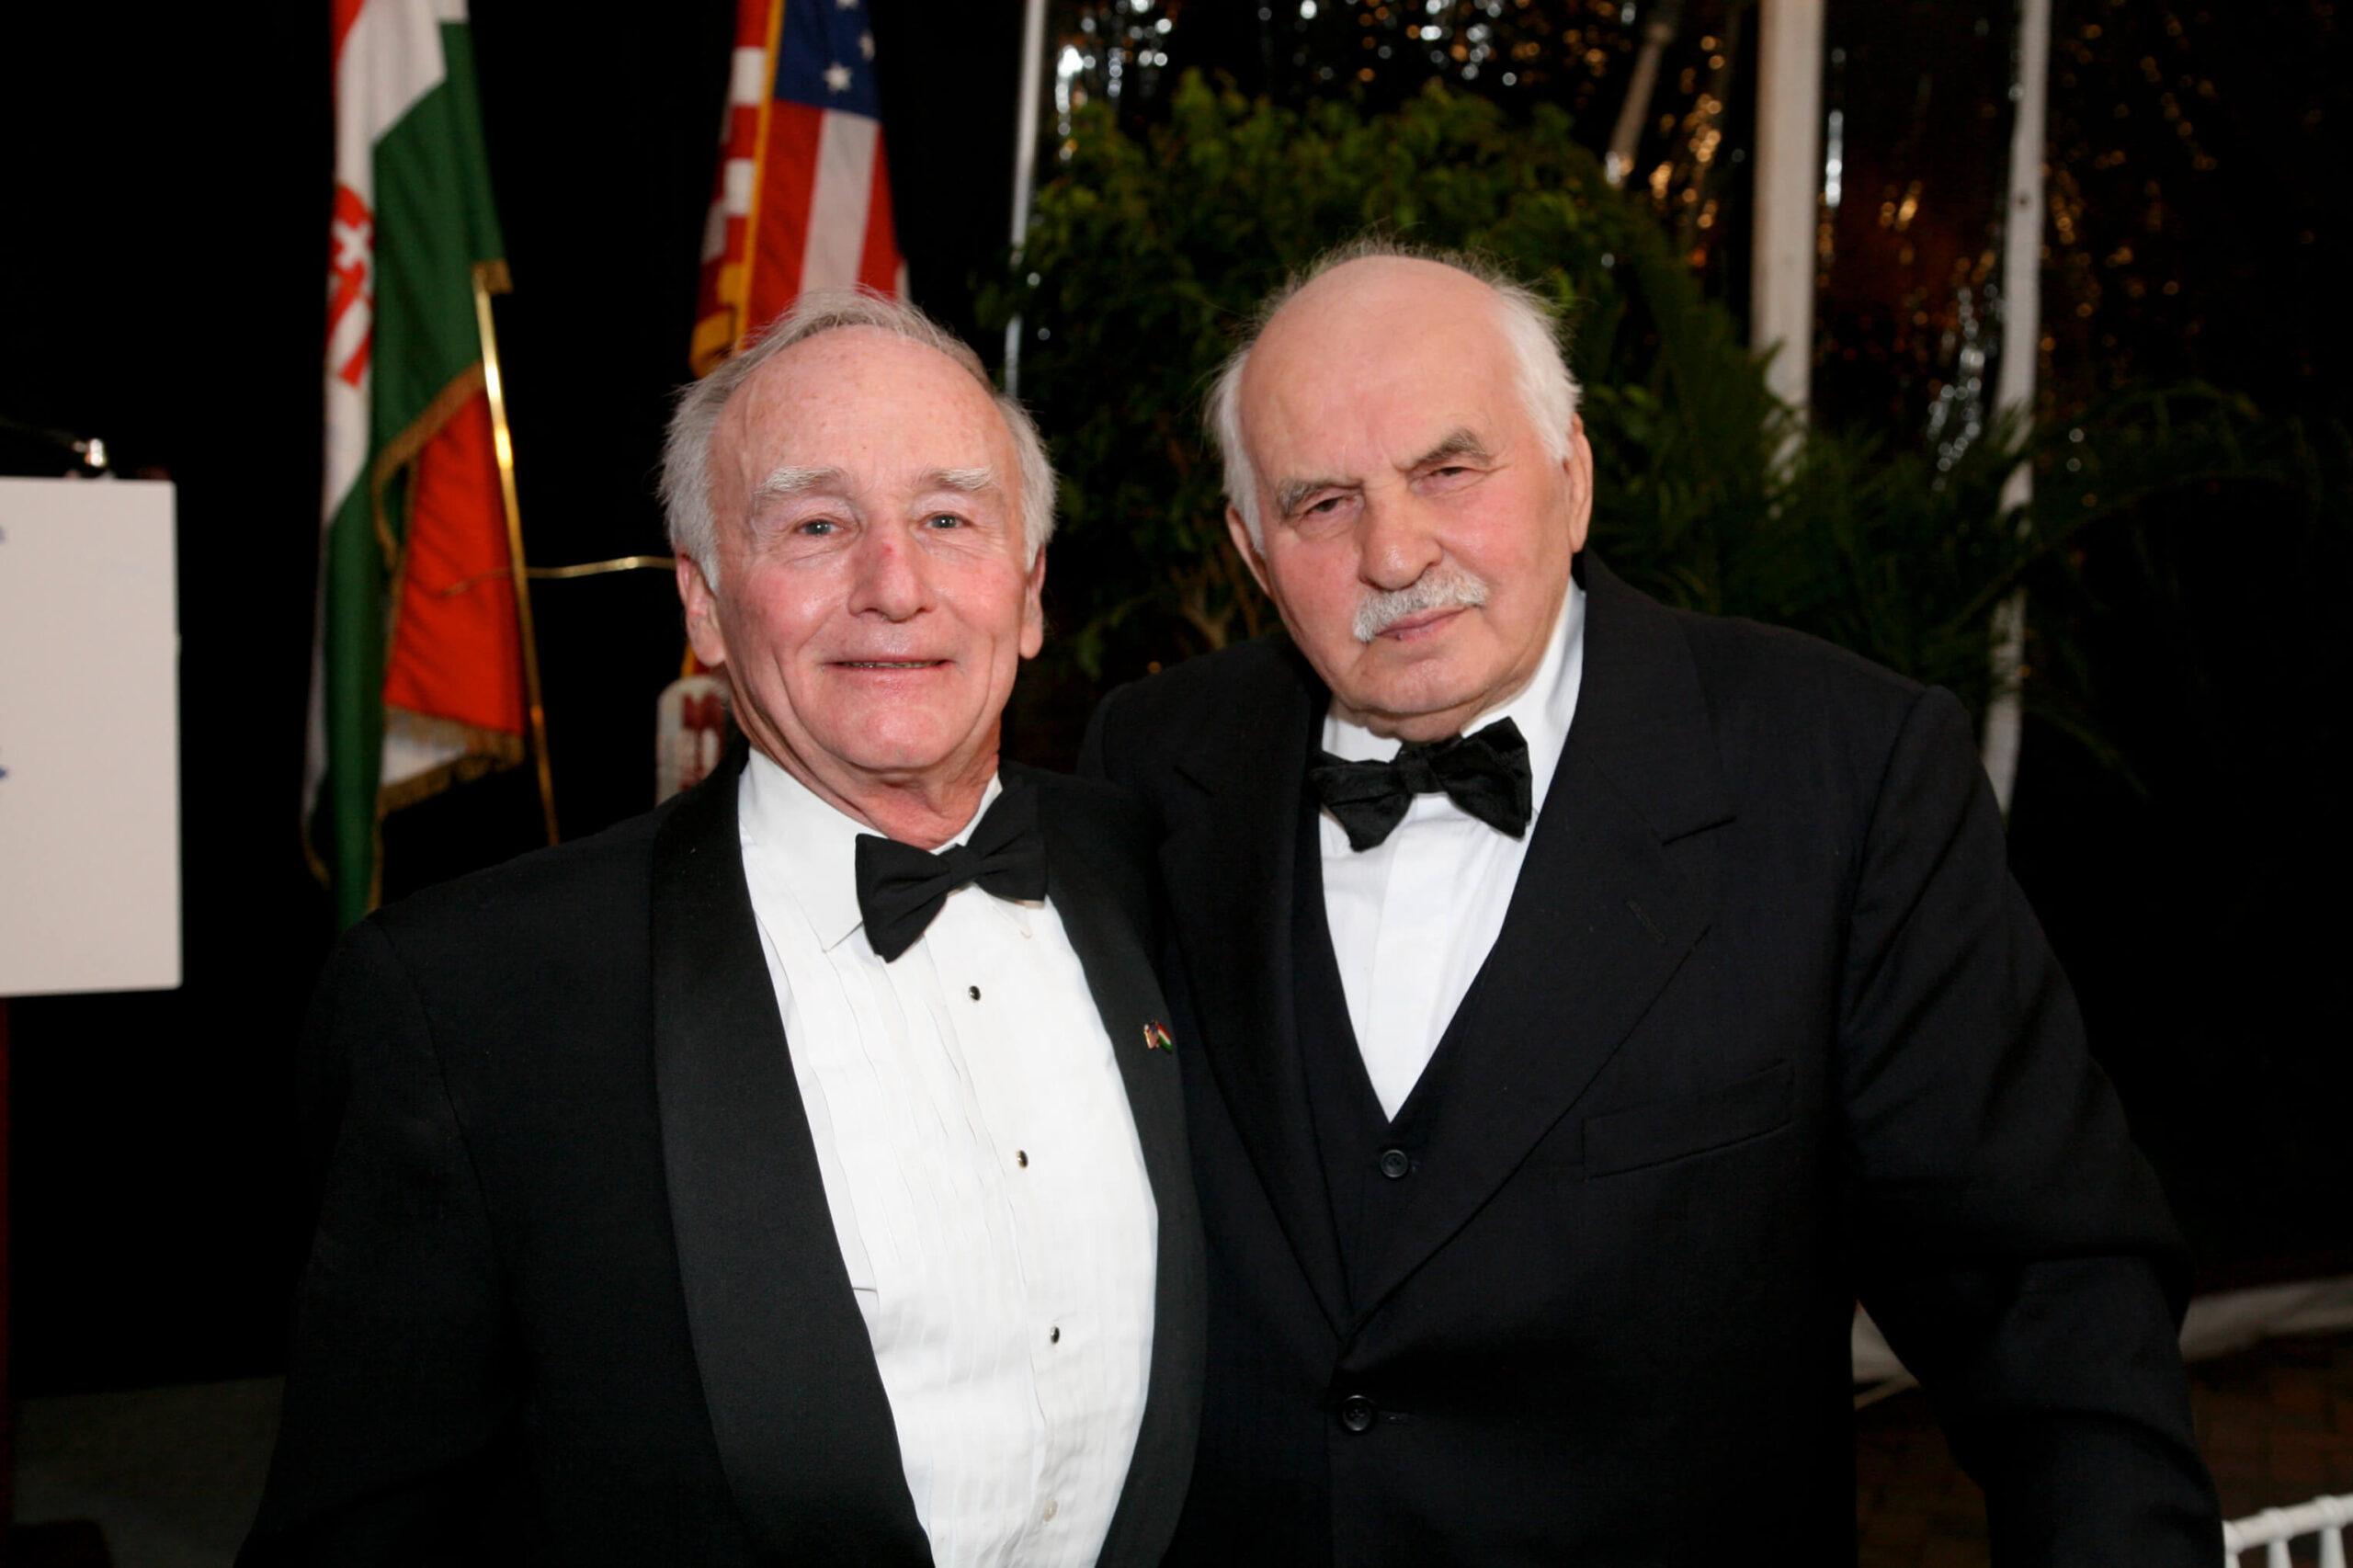 Amb. George Herbert Walker and H.E. Mr. Janos Horvath